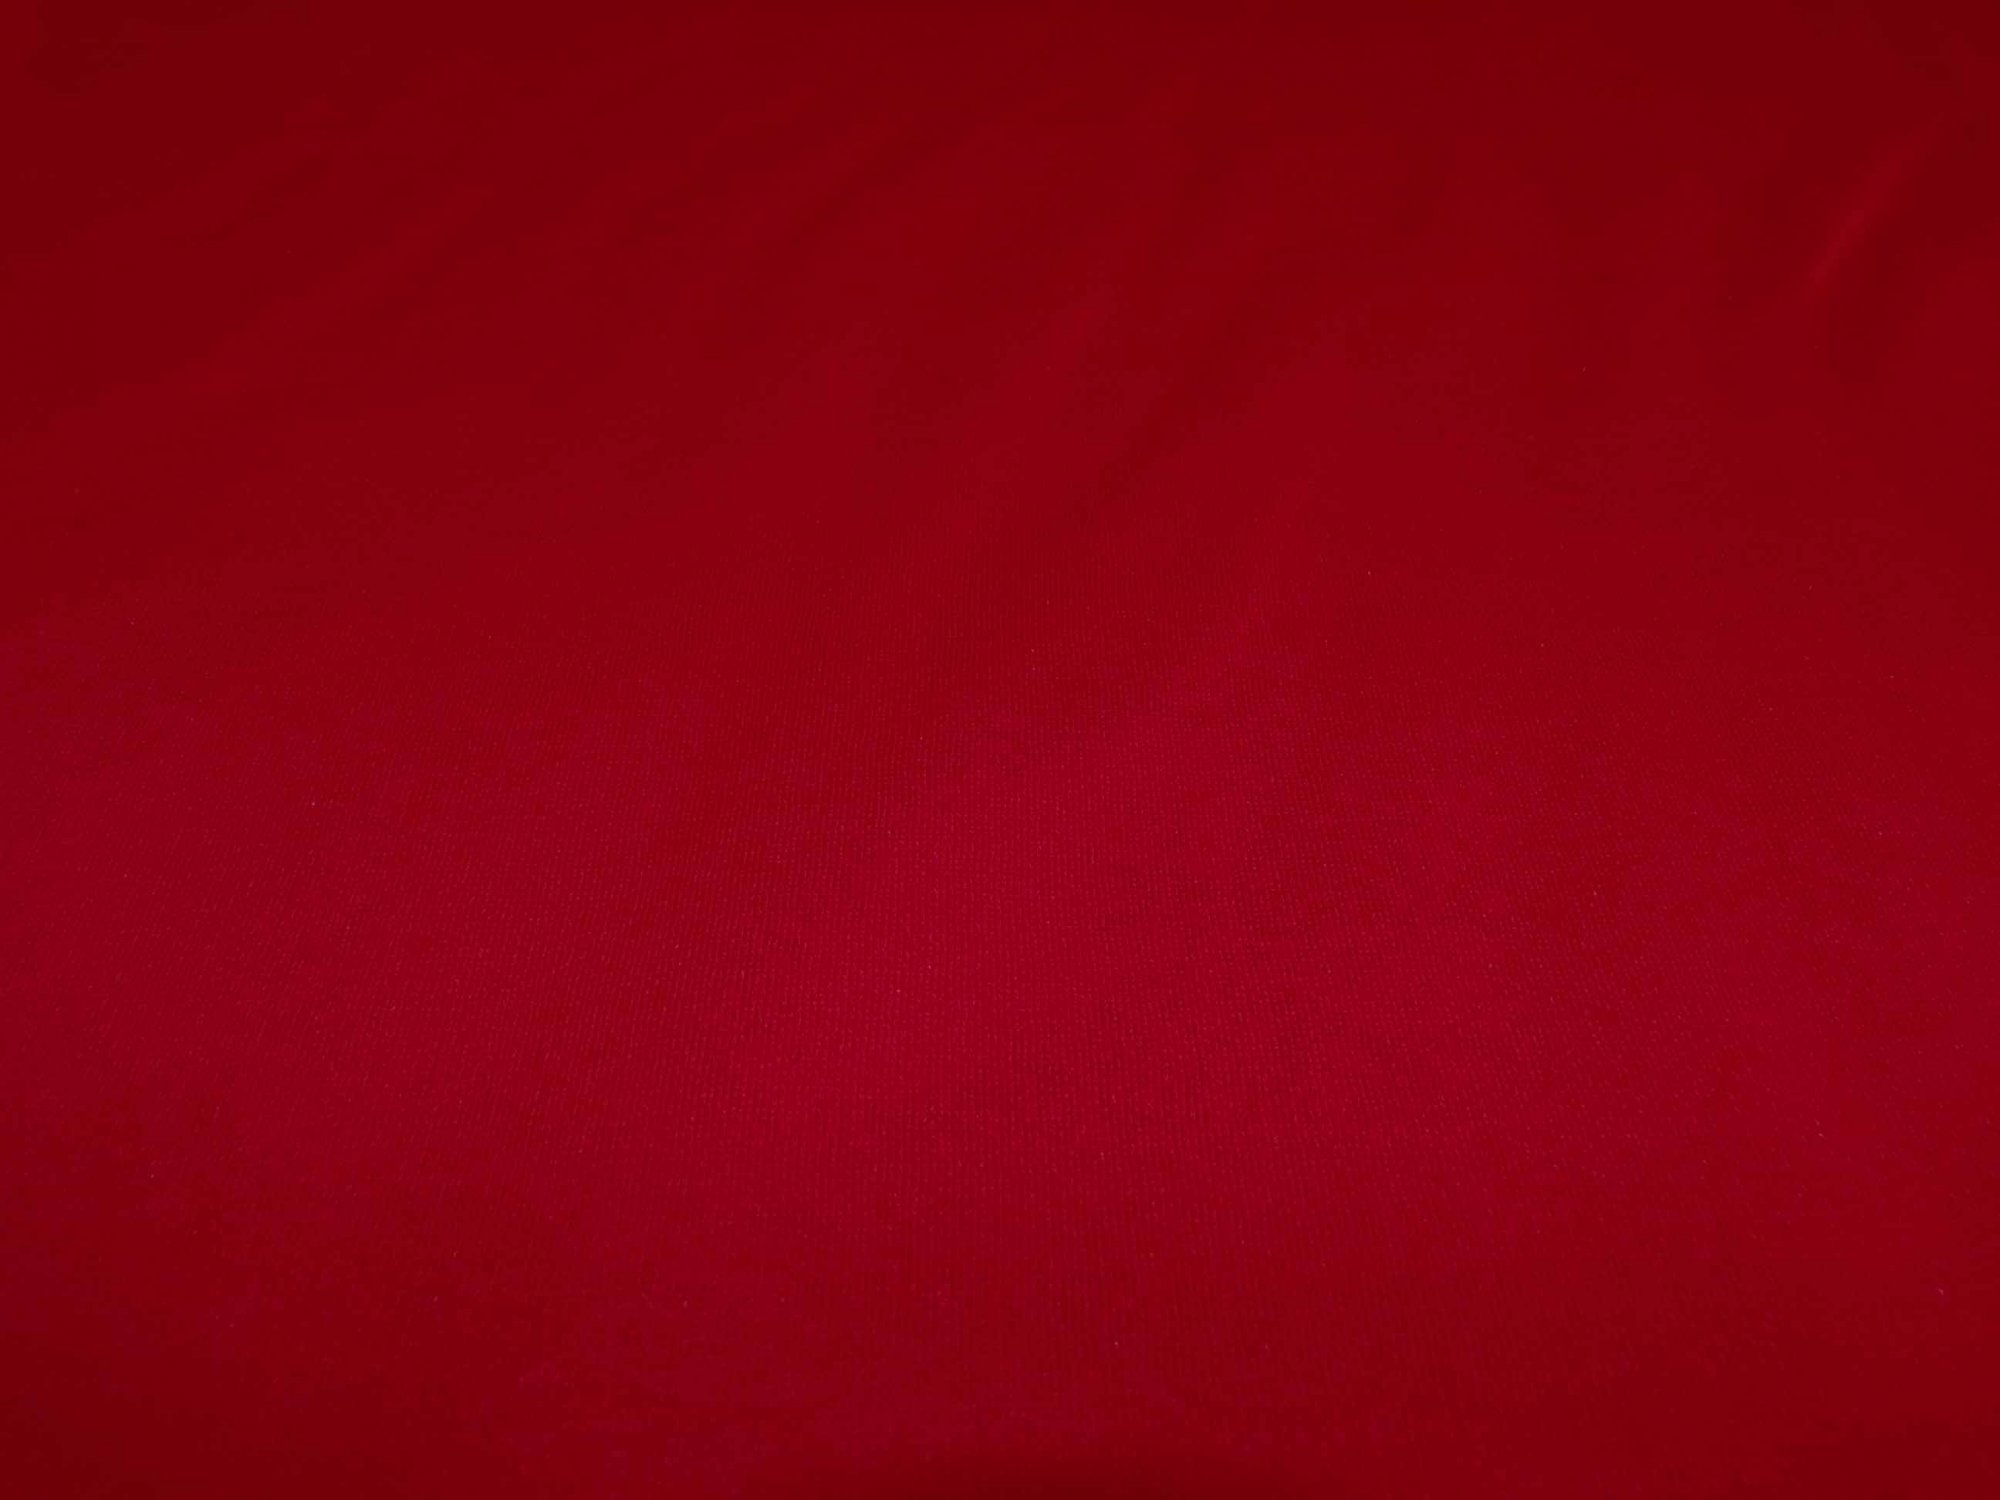 Red Sweatshirt Fleece